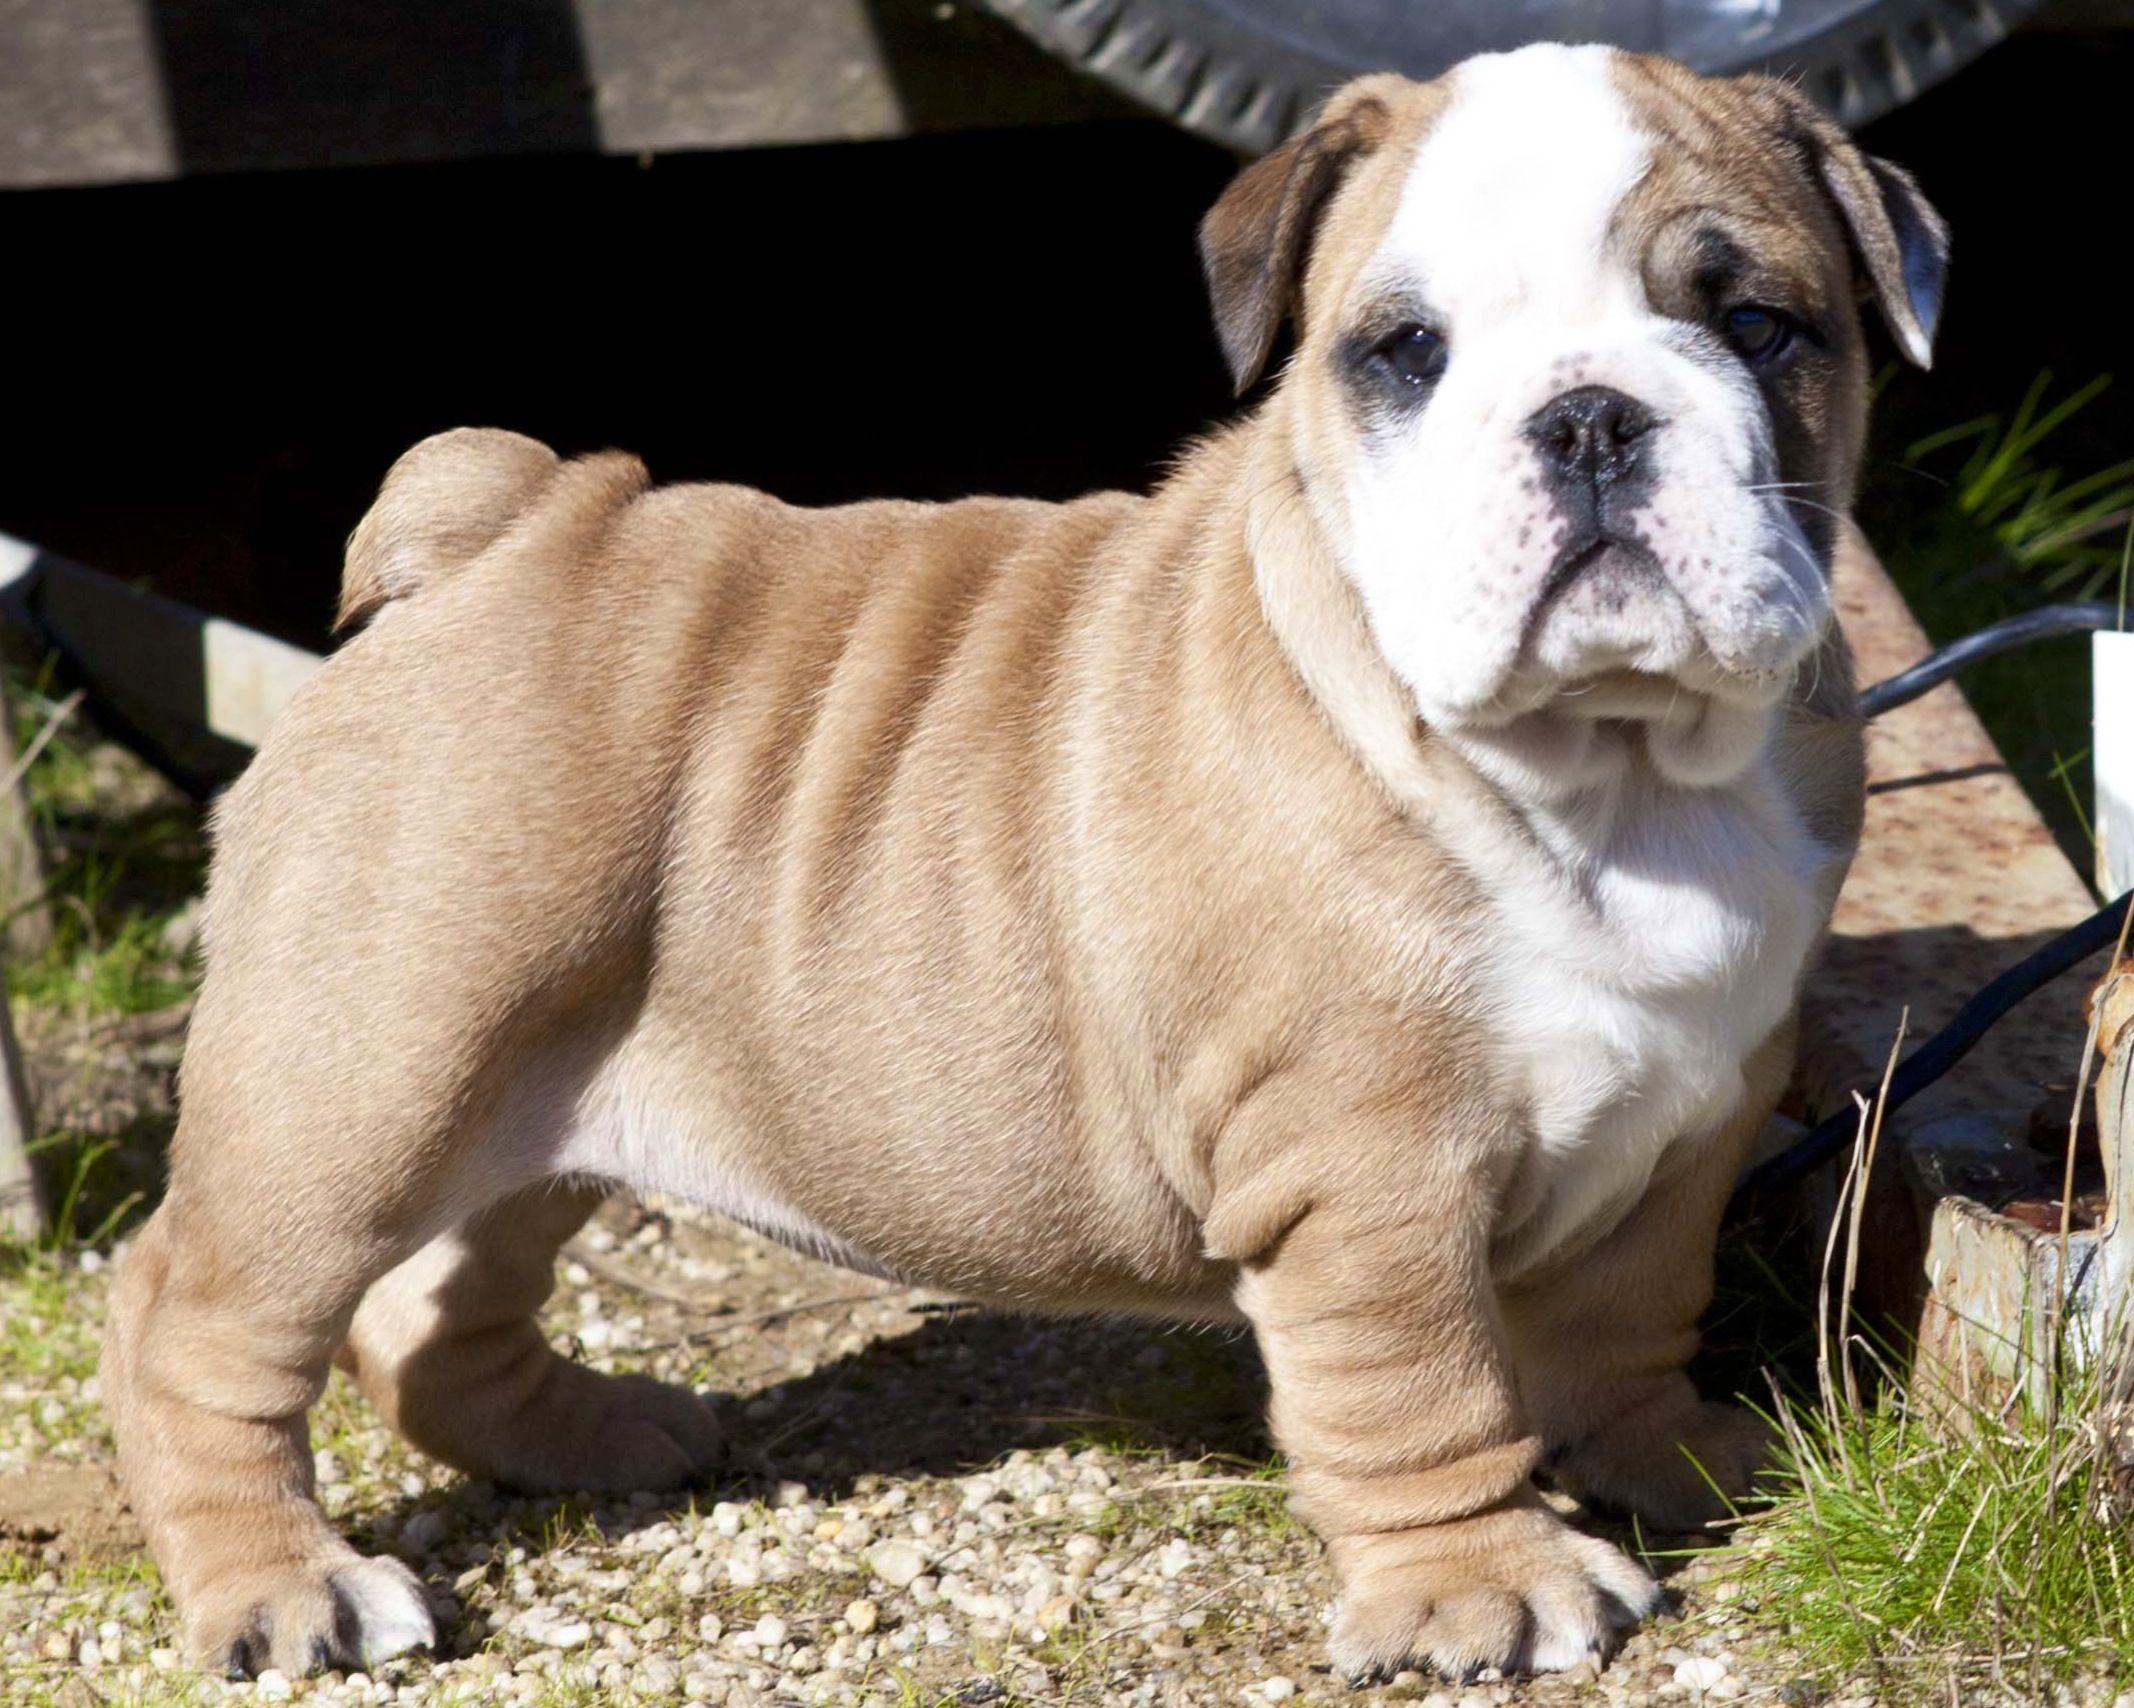 Maybe baby British bulldog, Lovers, French bulldog